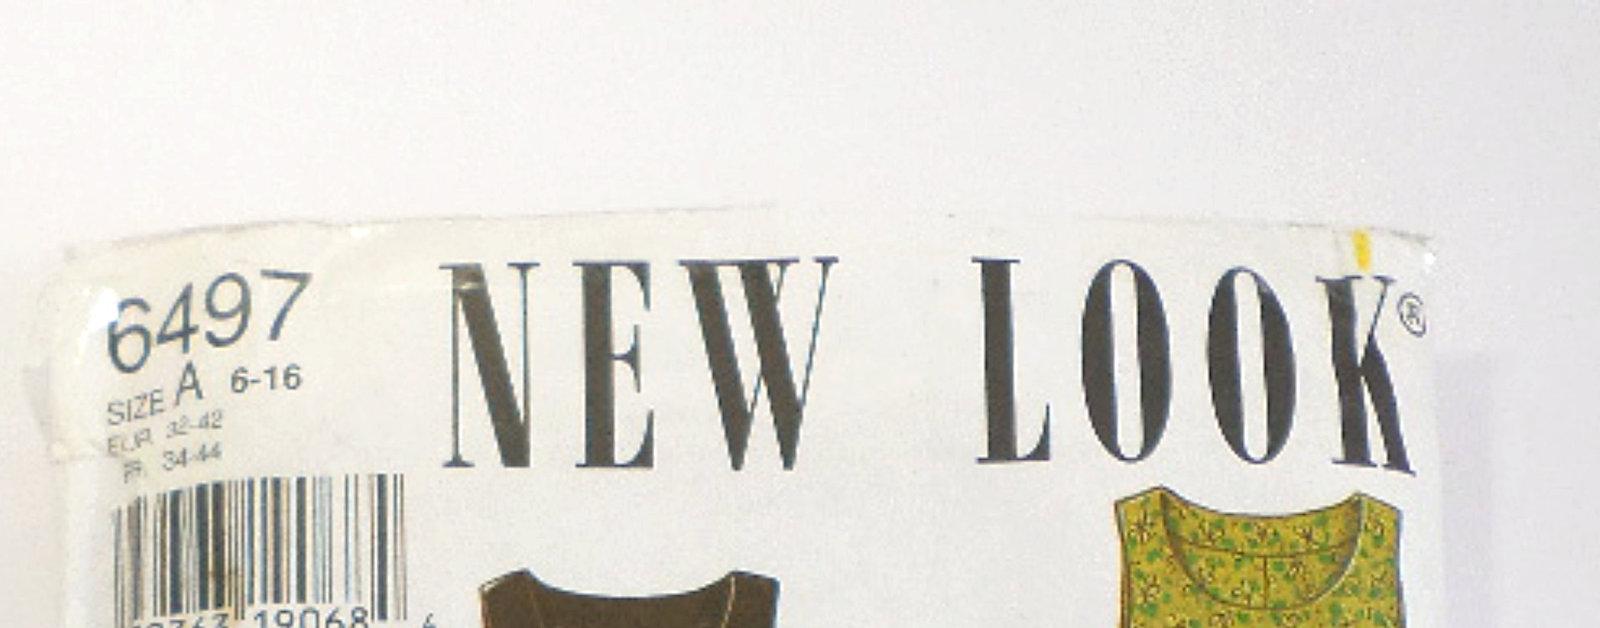 New Look Vintage Uncut Pattern #6497 Misses' Size A 6-16, Simplicity Separates